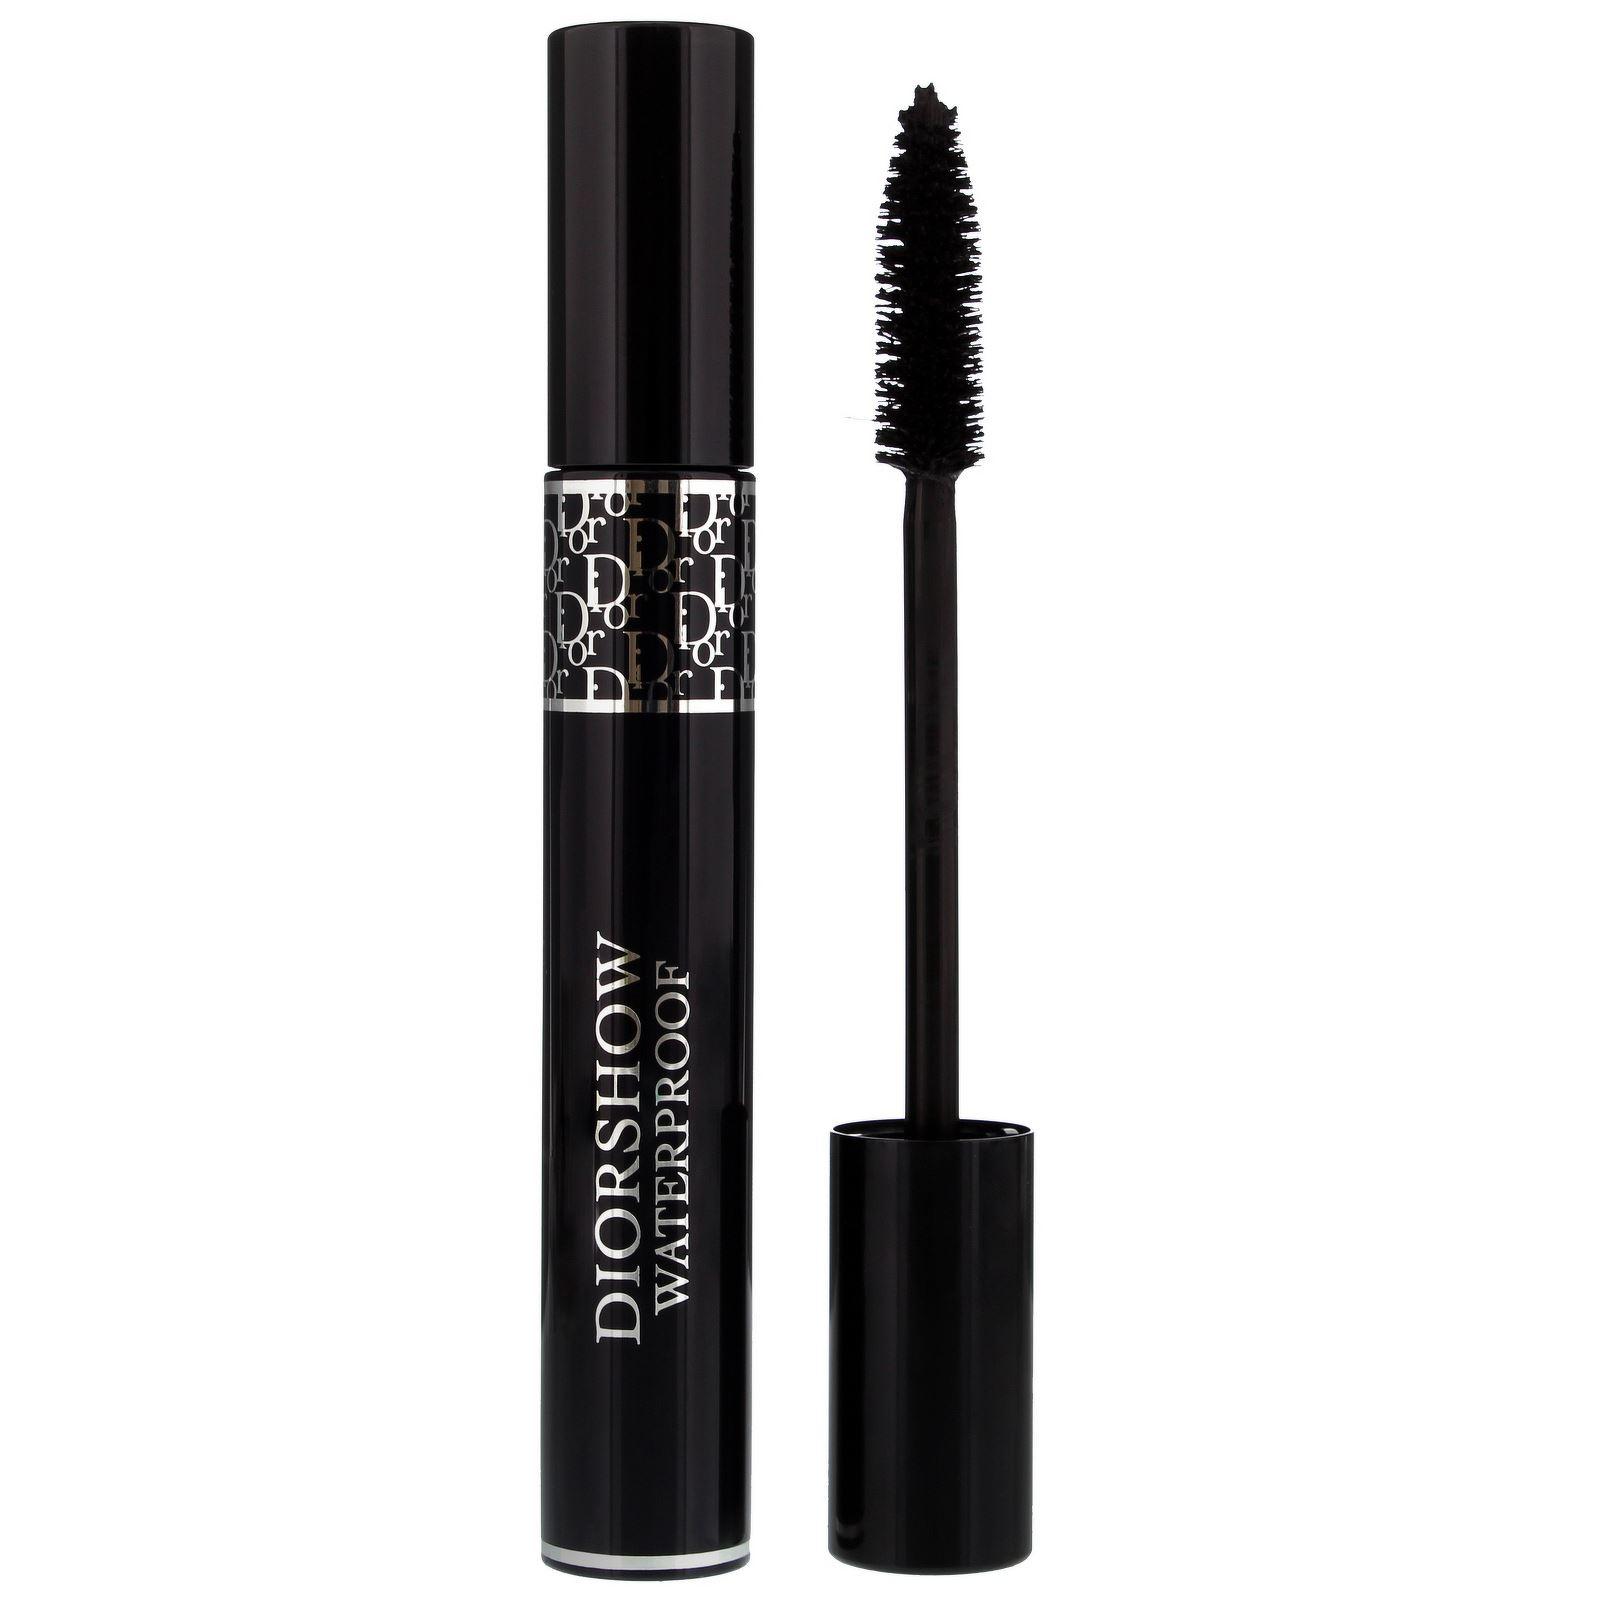 60e829b4855 Details about Christian Dior Diorshow Waterproof Buildable Vol.-Catwalk Black  11.5ml Mascara